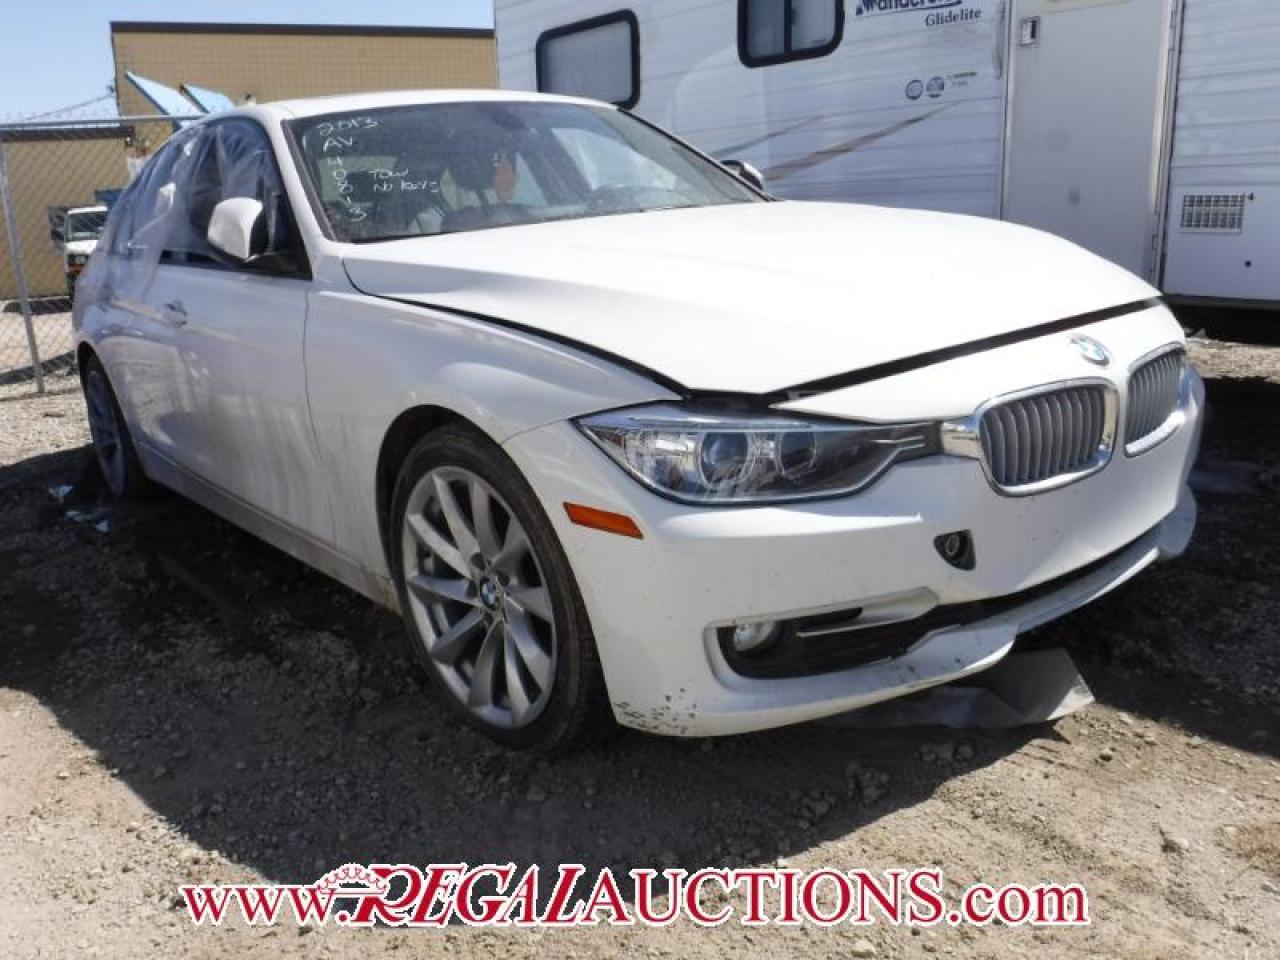 Photo of White 2013 BMW 3 SERIES 320I XDRIVE 4D SEDAN